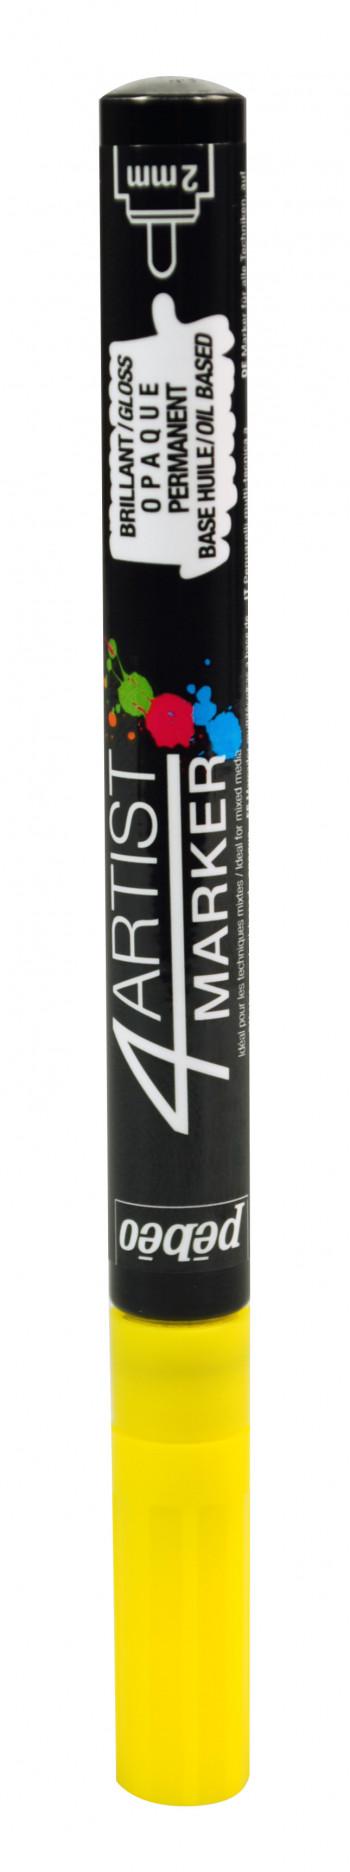 Художественный маркер 4ARTIST MARKER на масляной основе 2 мм Желтый